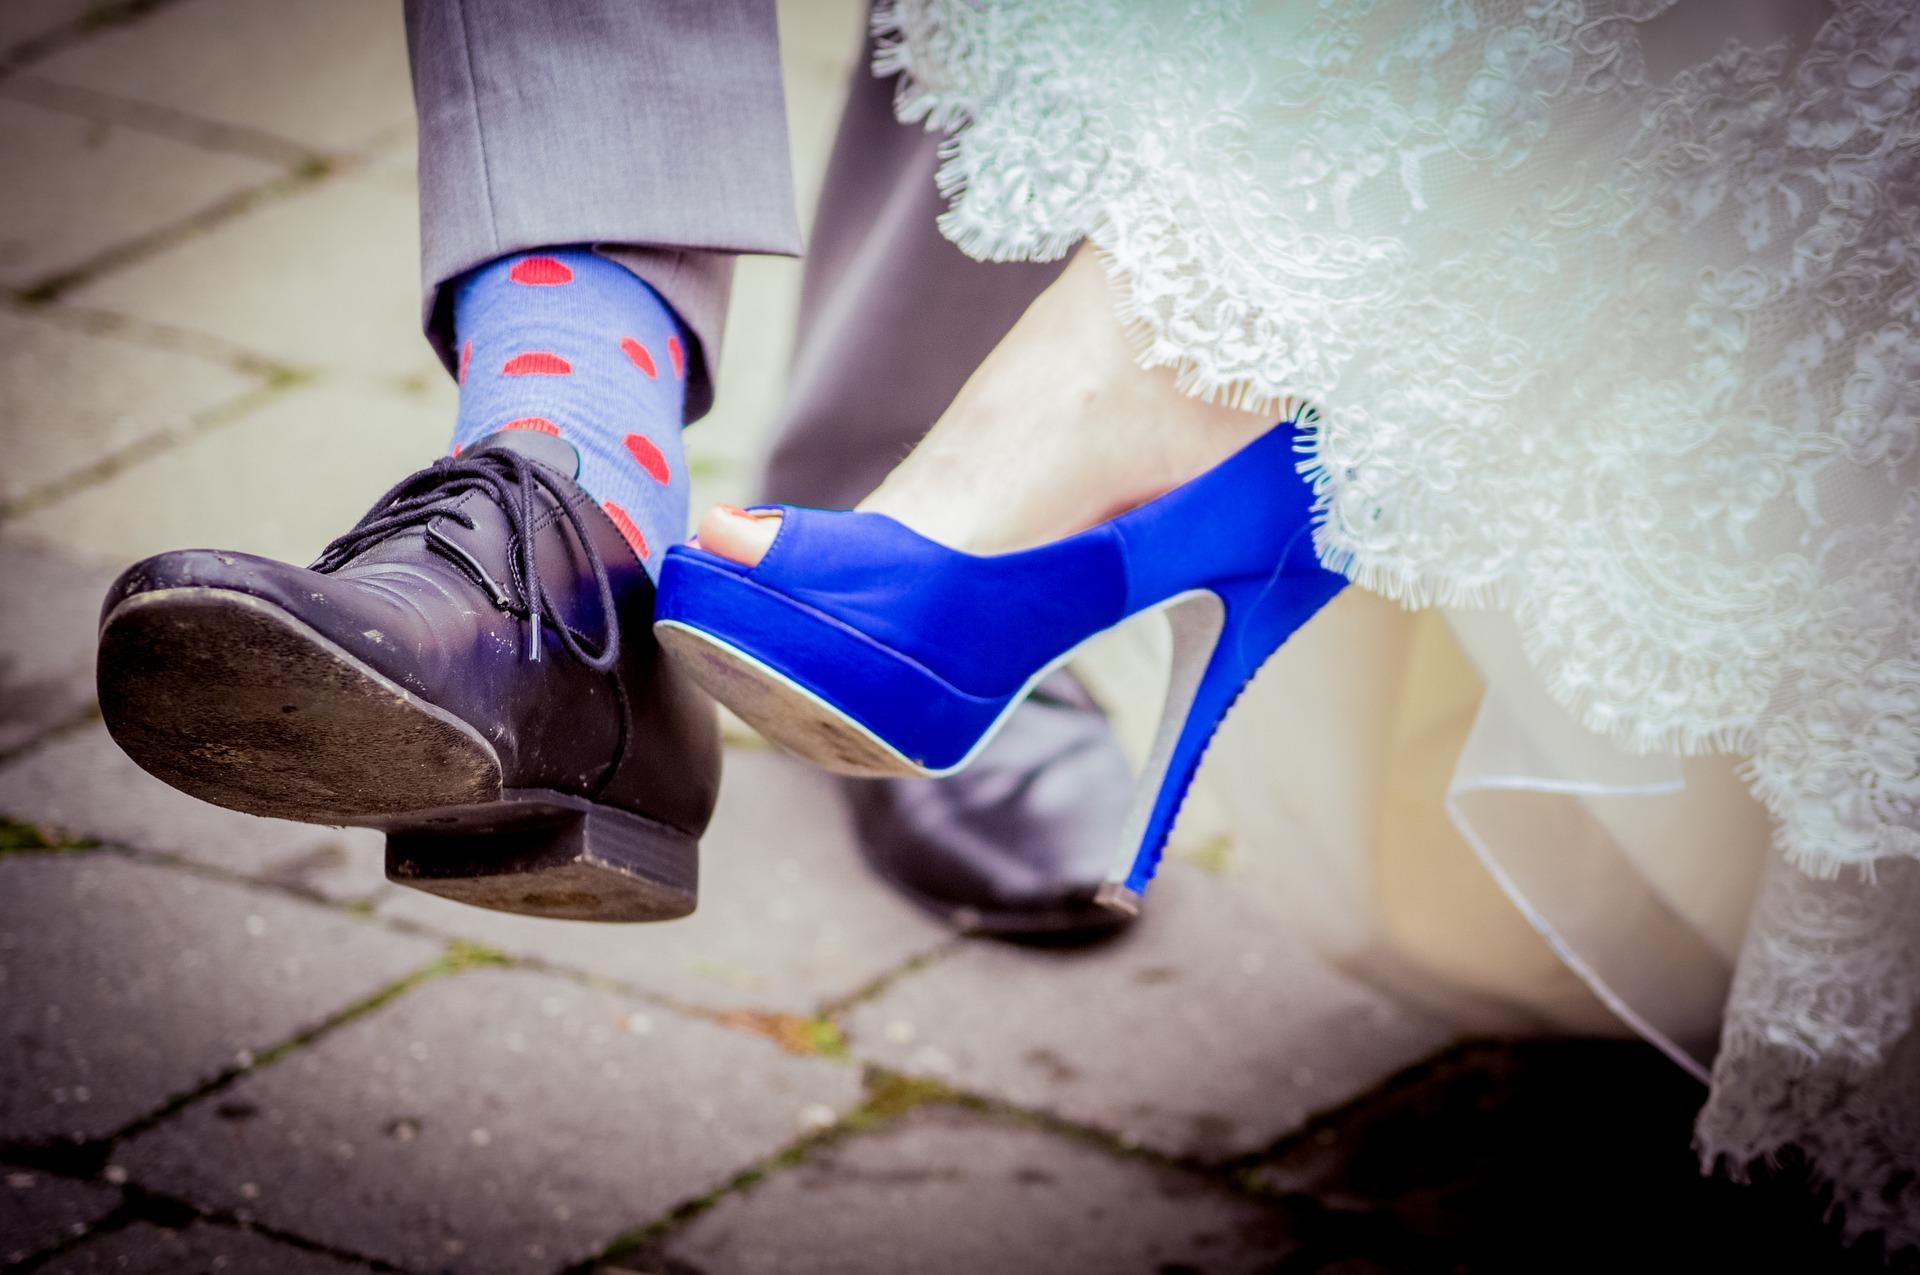 wedding-shoes-1470677_1920.jpg